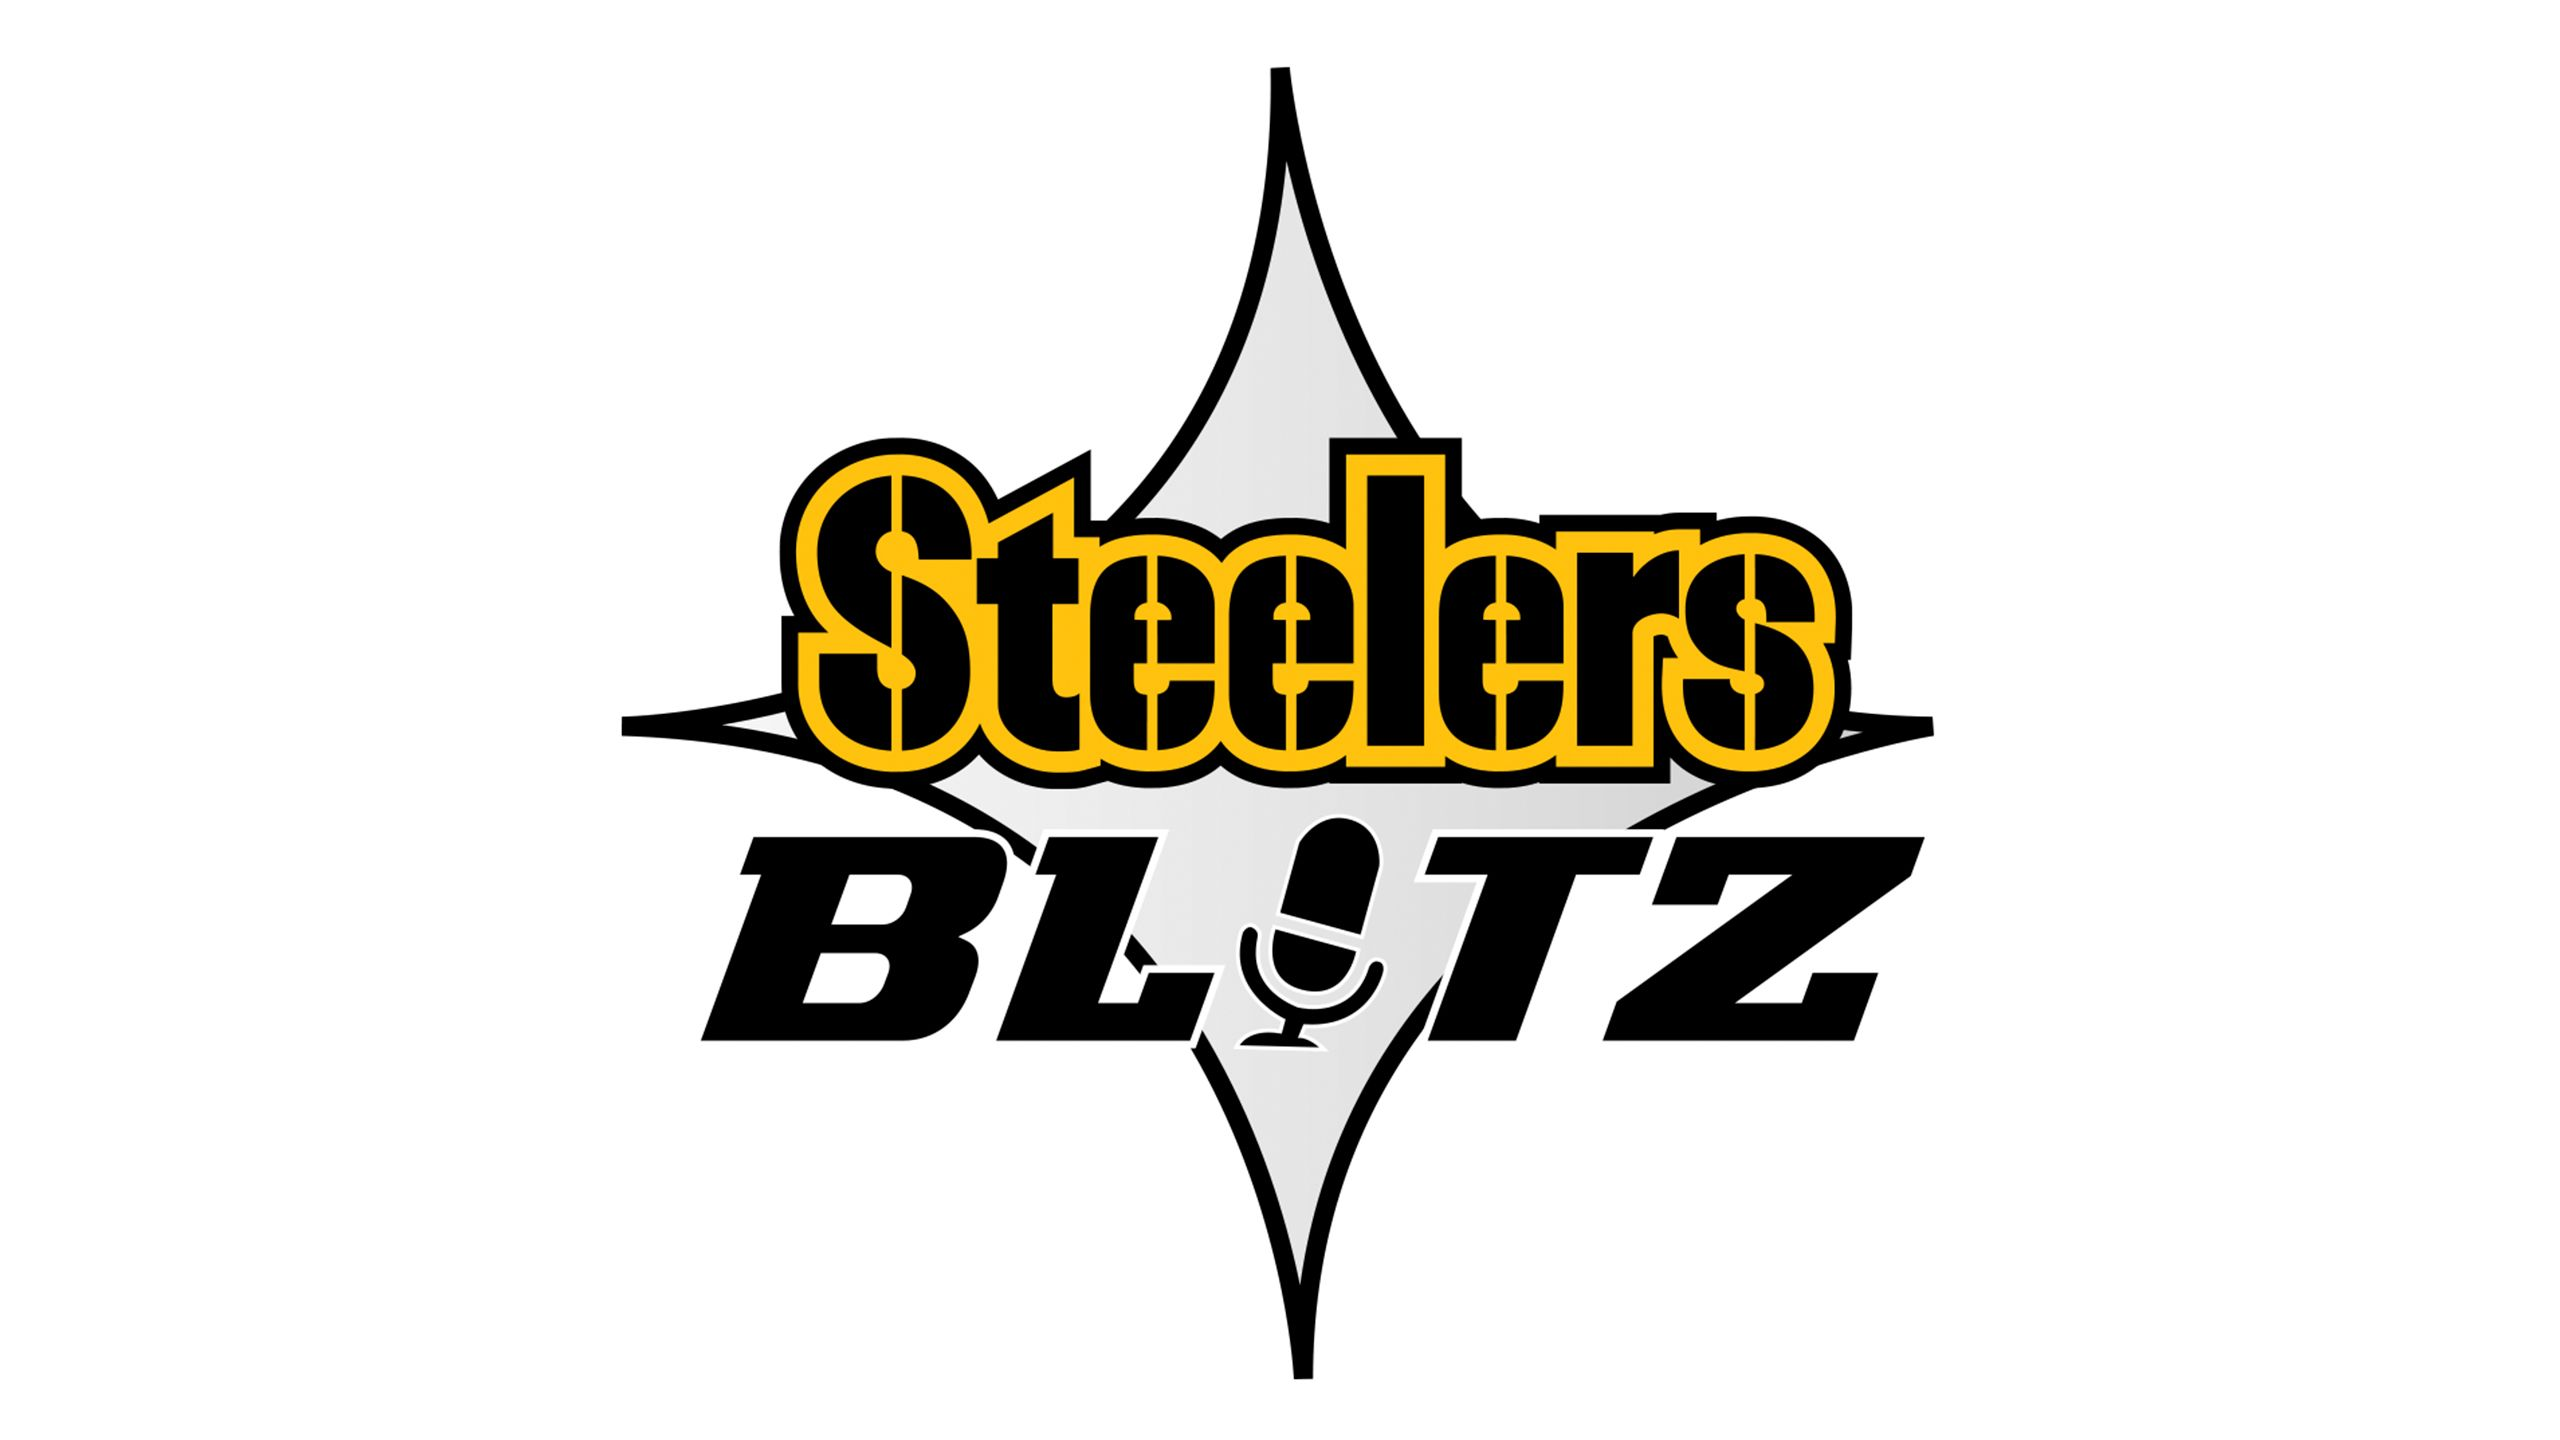 Steelers Blitz